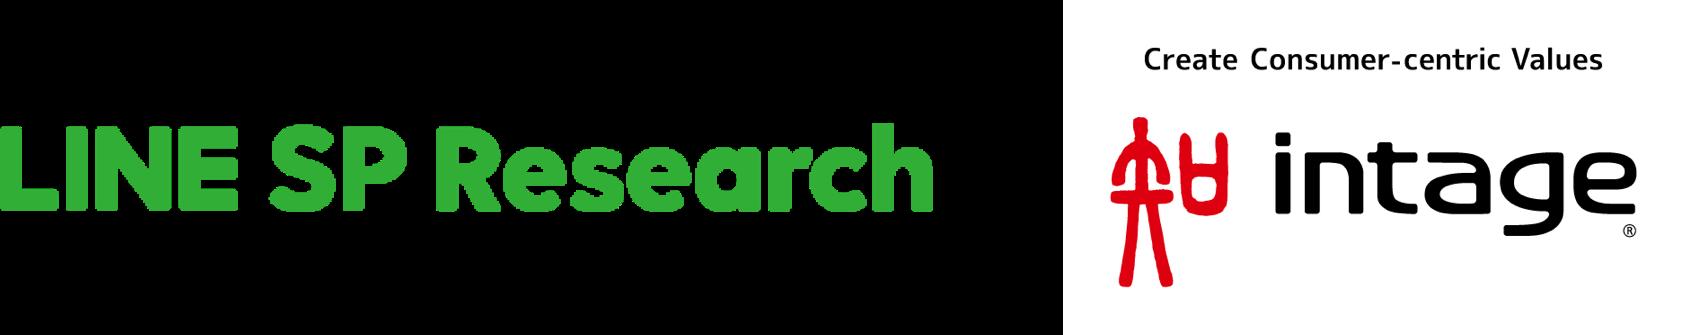 /stf/linecorp/ja/pr/spresearch.png